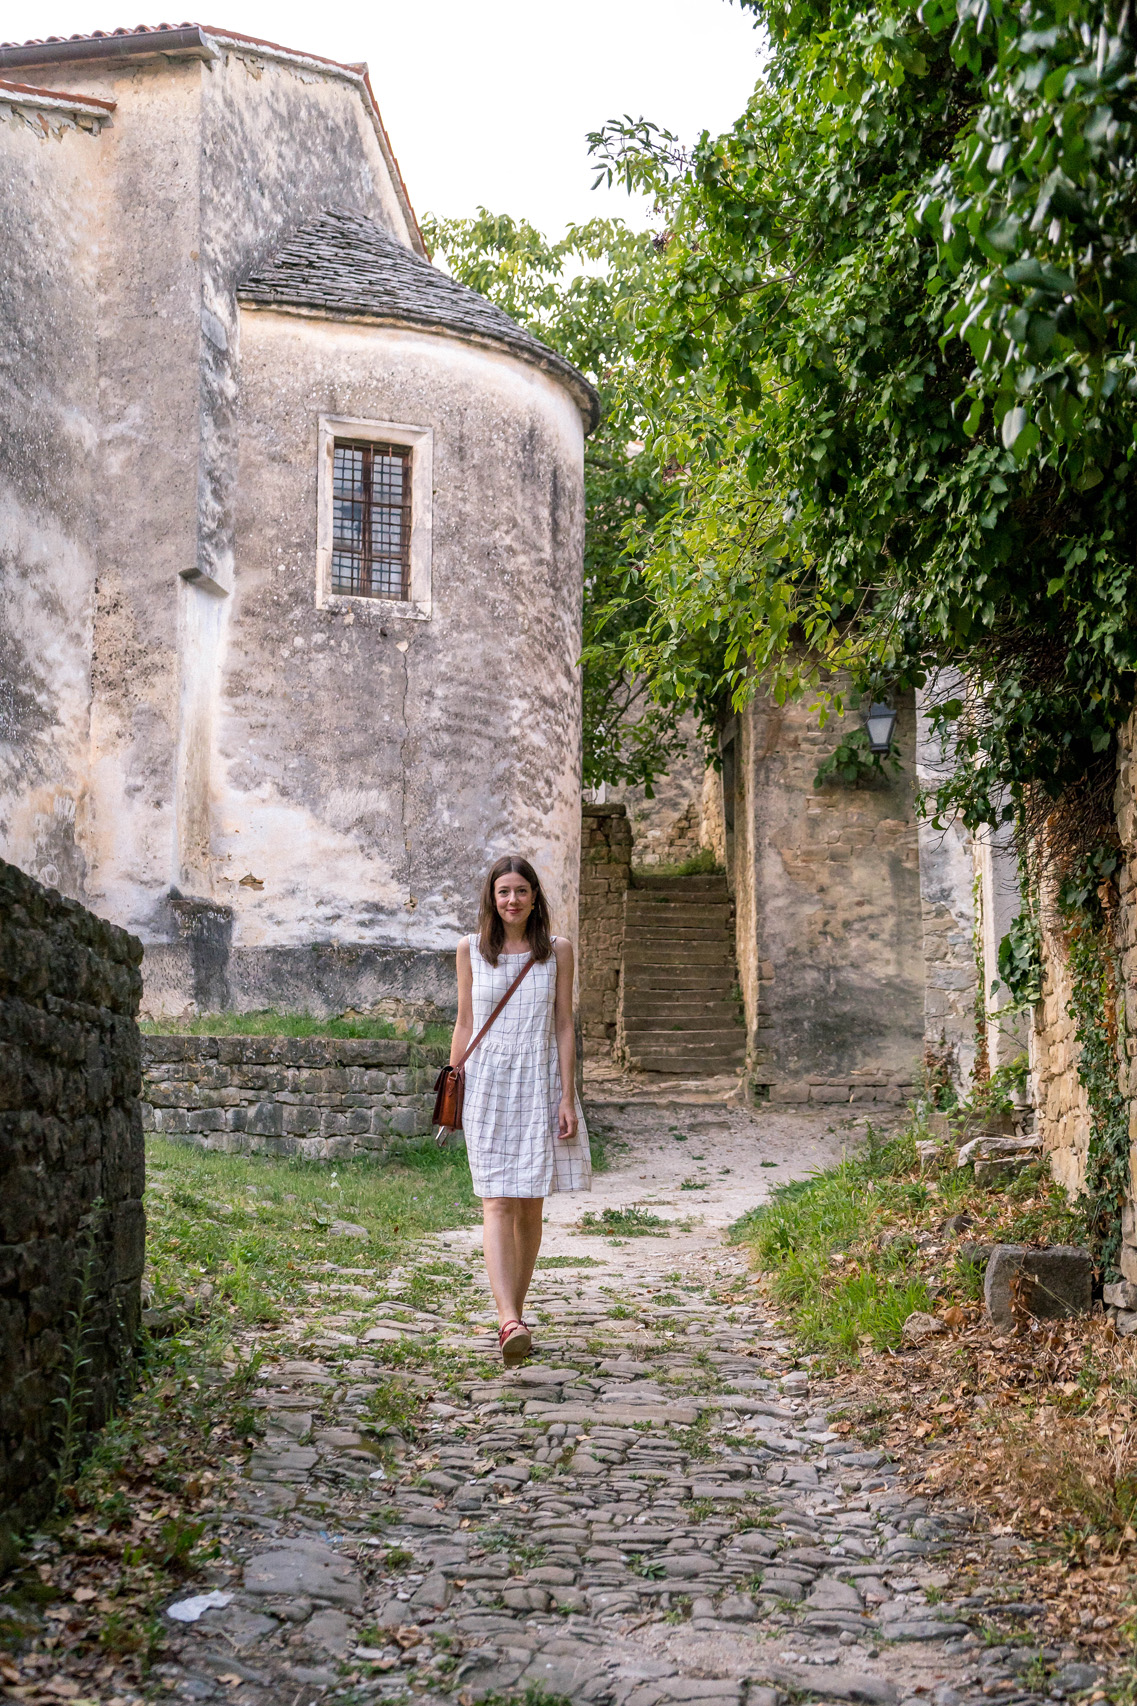 Walking the empty streets of Zavrsje, Istria